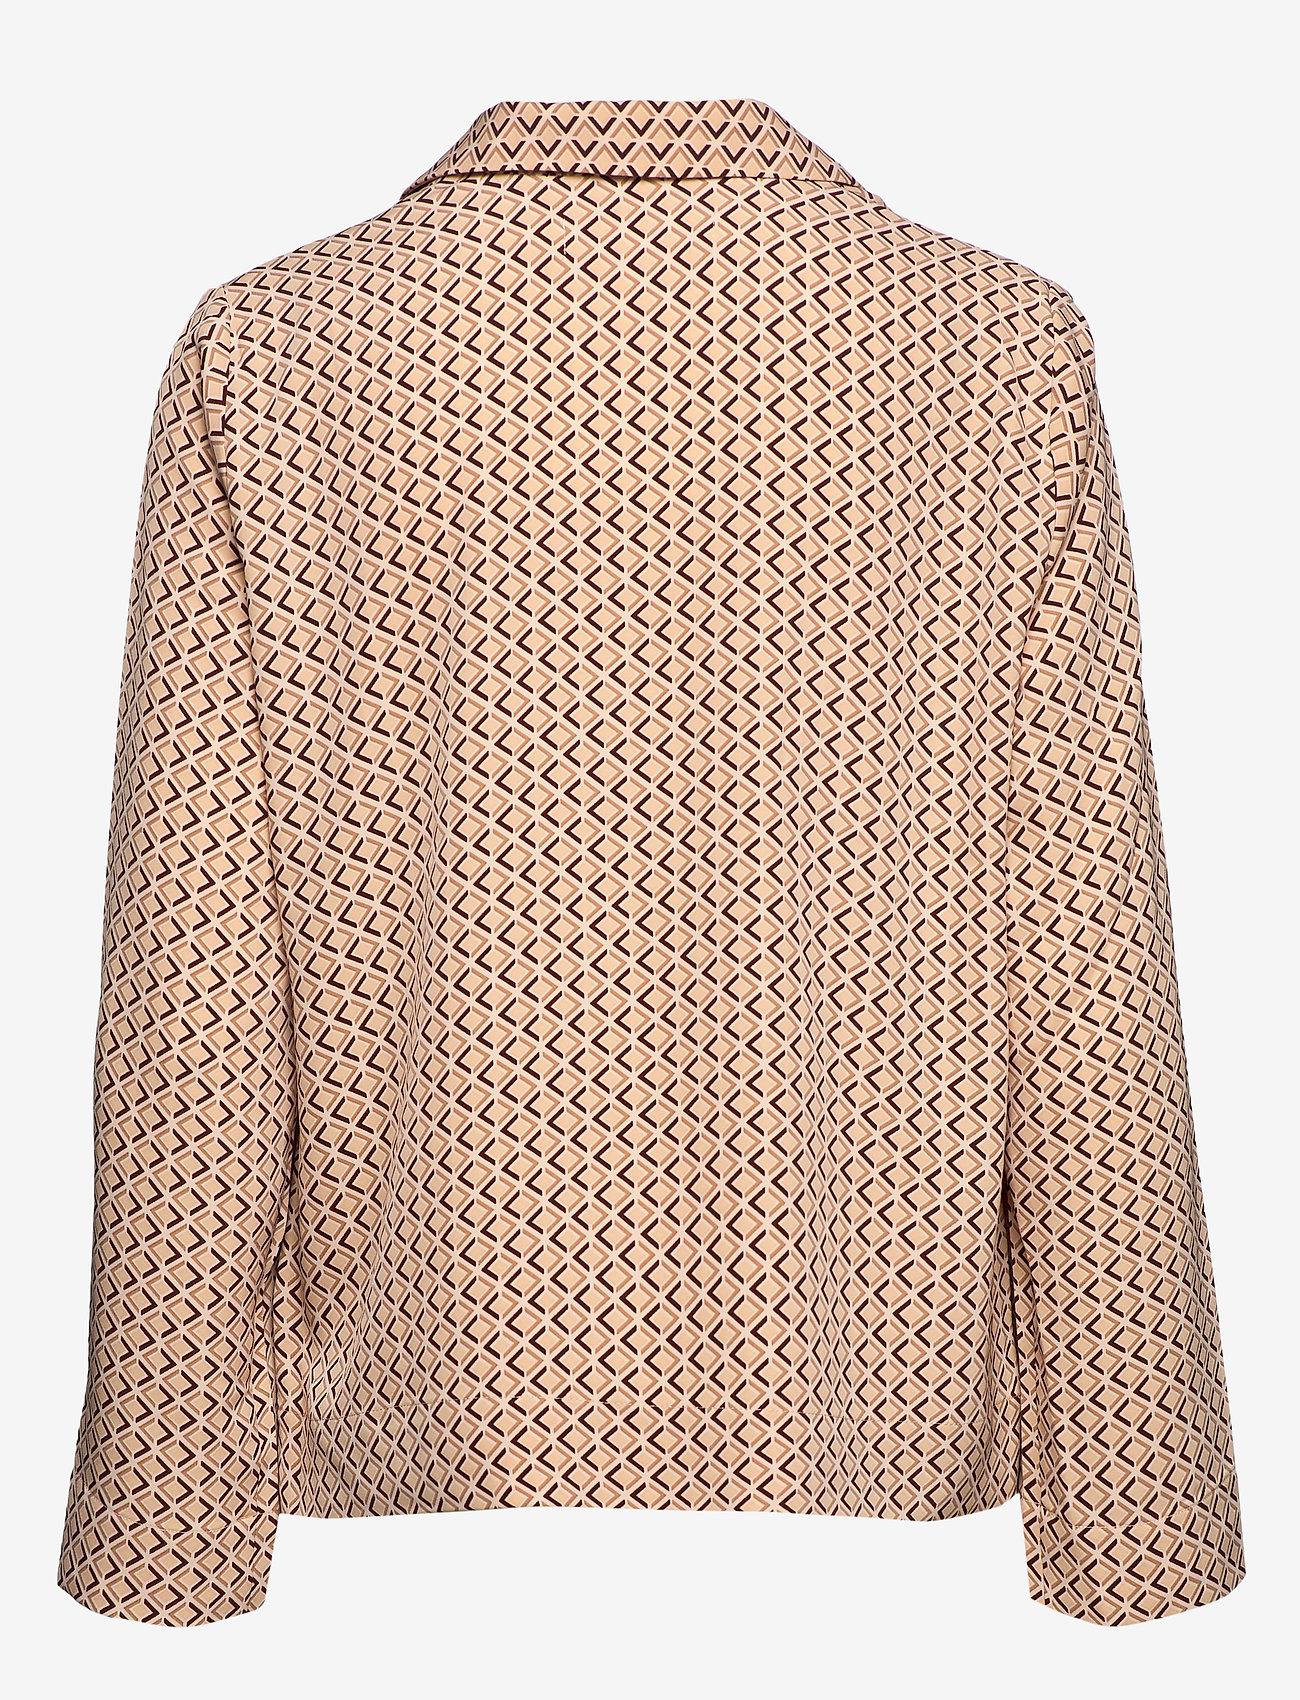 Camilleiw Shirt (Geometric Square) - InWear WuEy4X